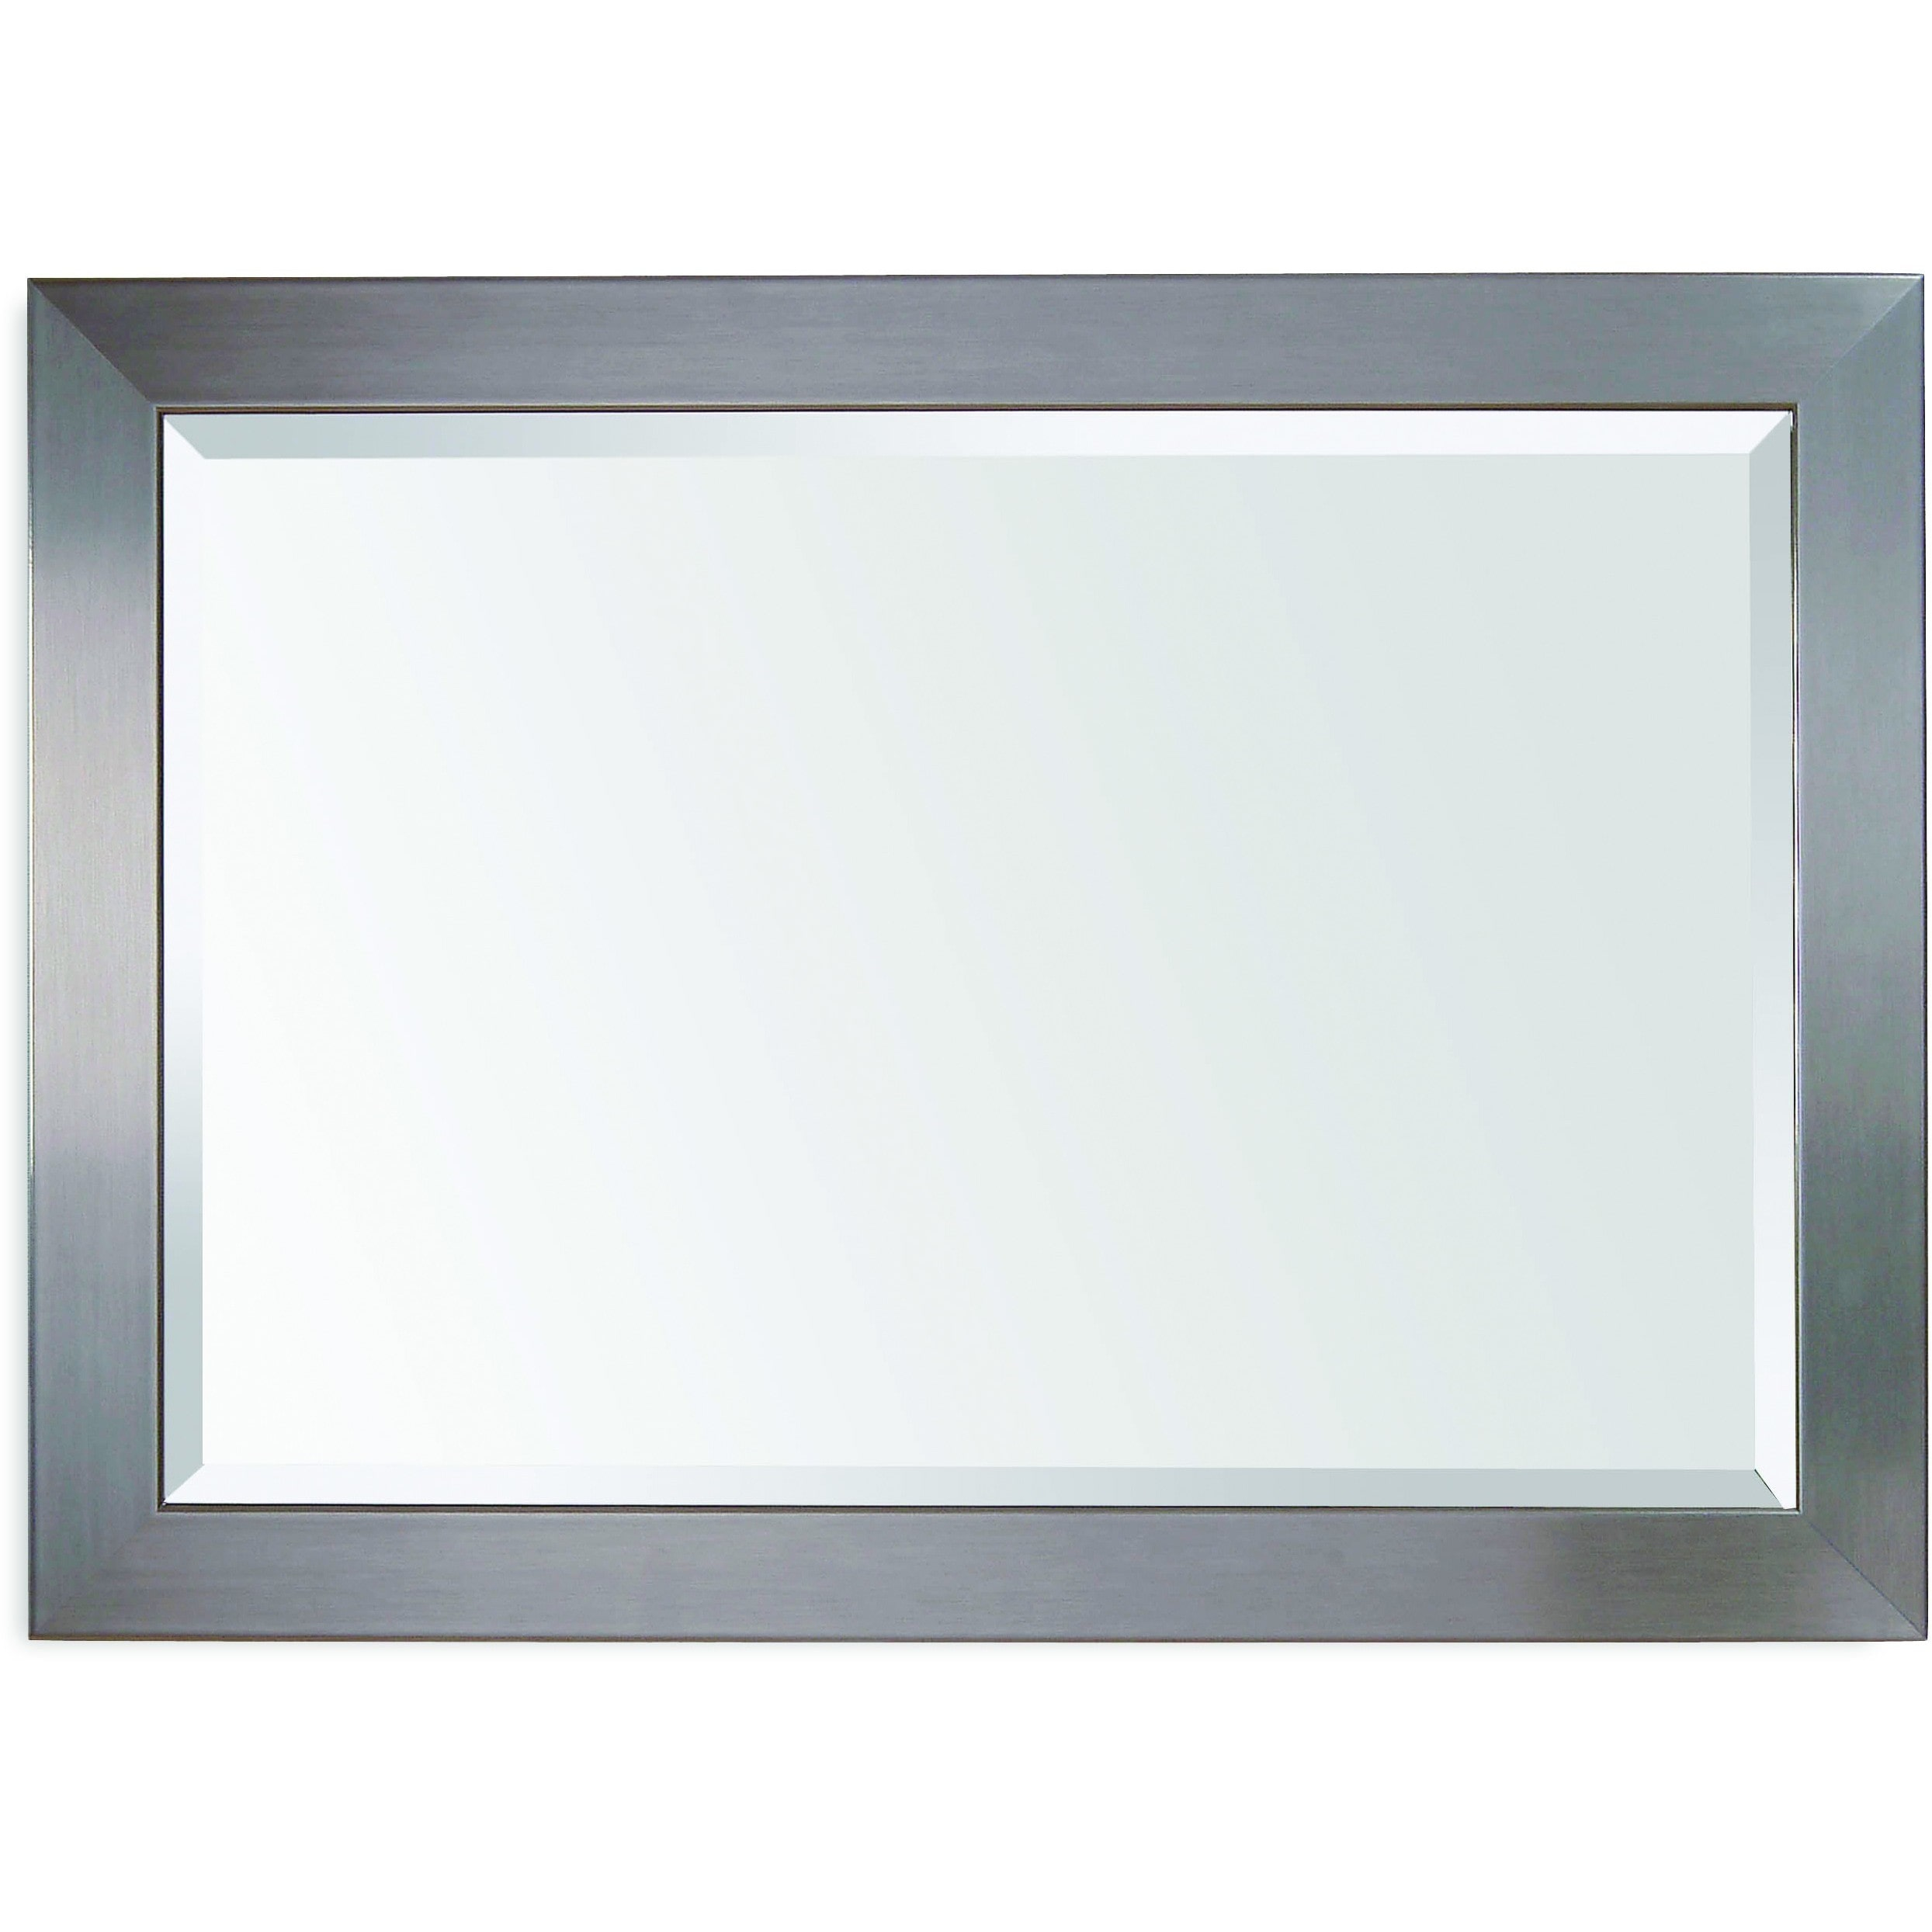 Bassett Mirror Company Stainless Silver Wall Mirror by Bassett Mirror